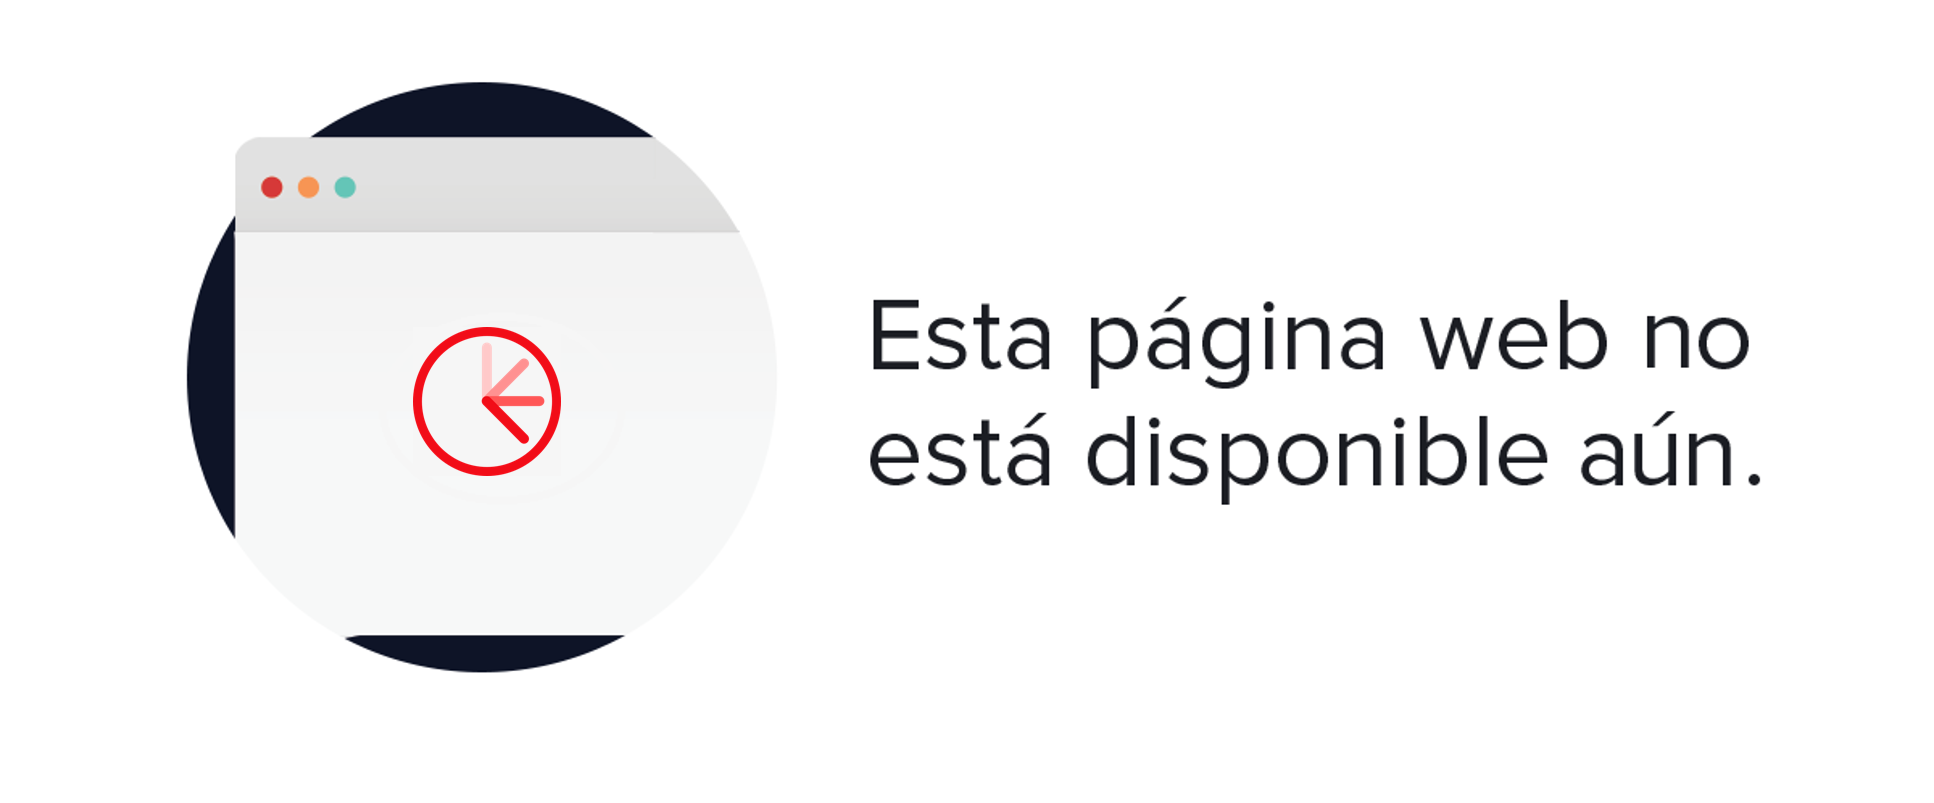 Paruno - Botín Café - Café - P227773 - DSFMOJL Botas Hombre